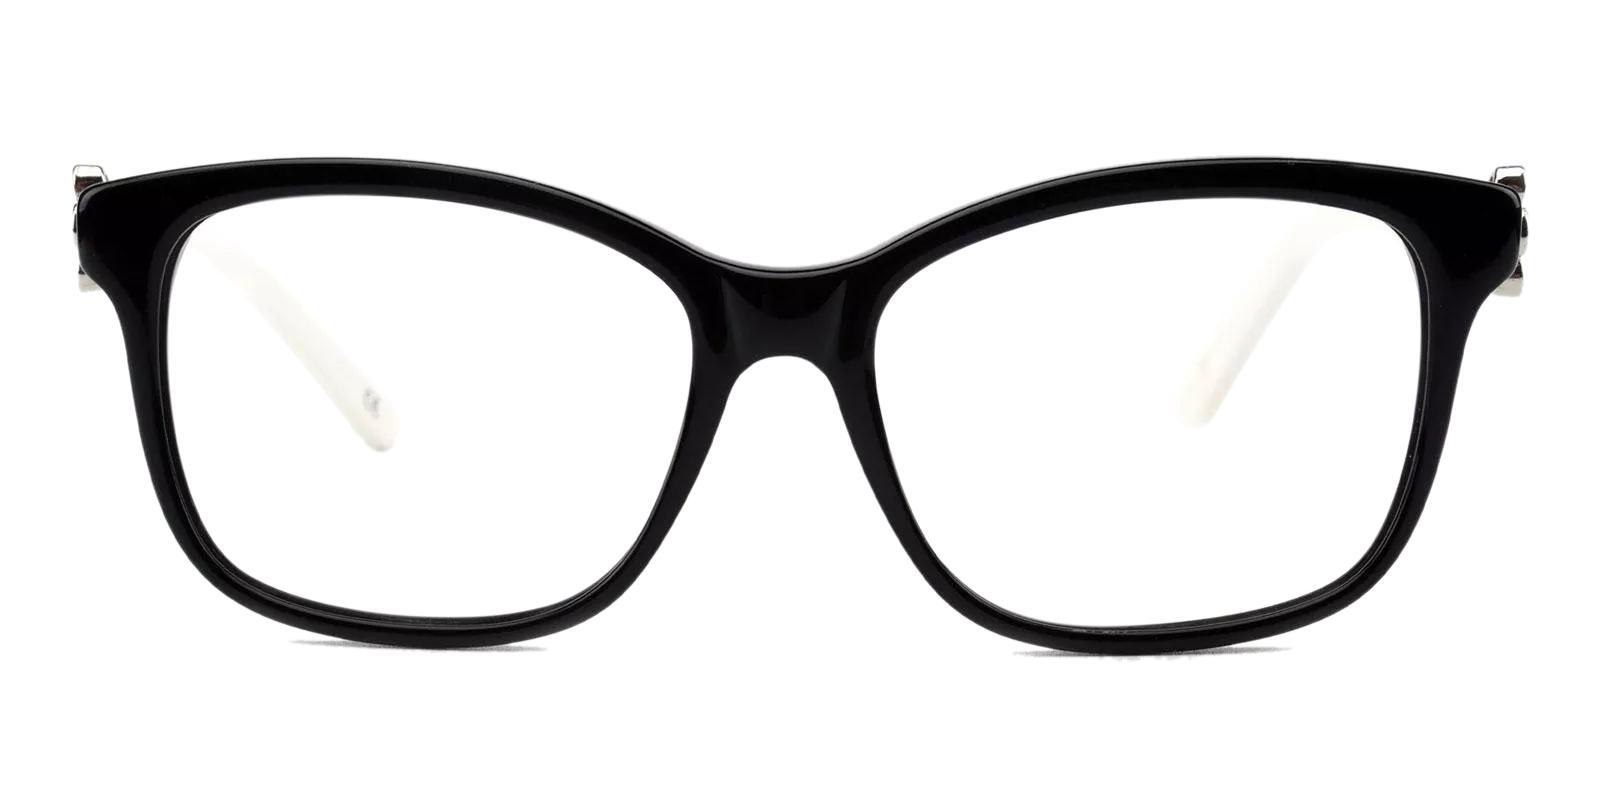 Paula Black Acetate Eyeglasses , Fashion , UniversalBridgeFit Frames from ABBE Glasses